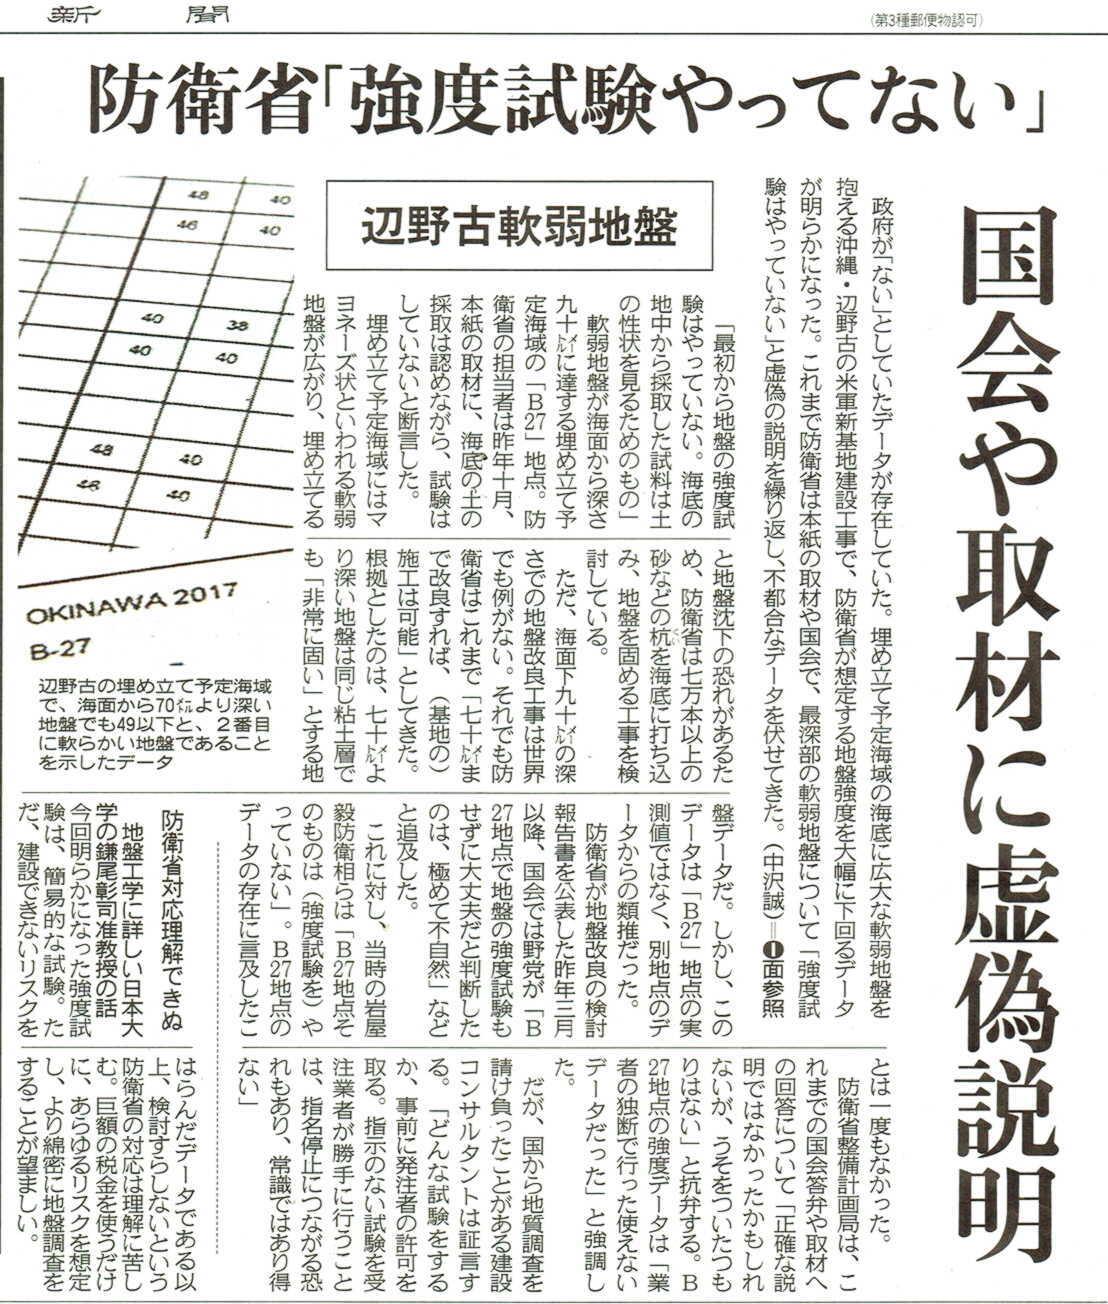 tokyo2020 02082